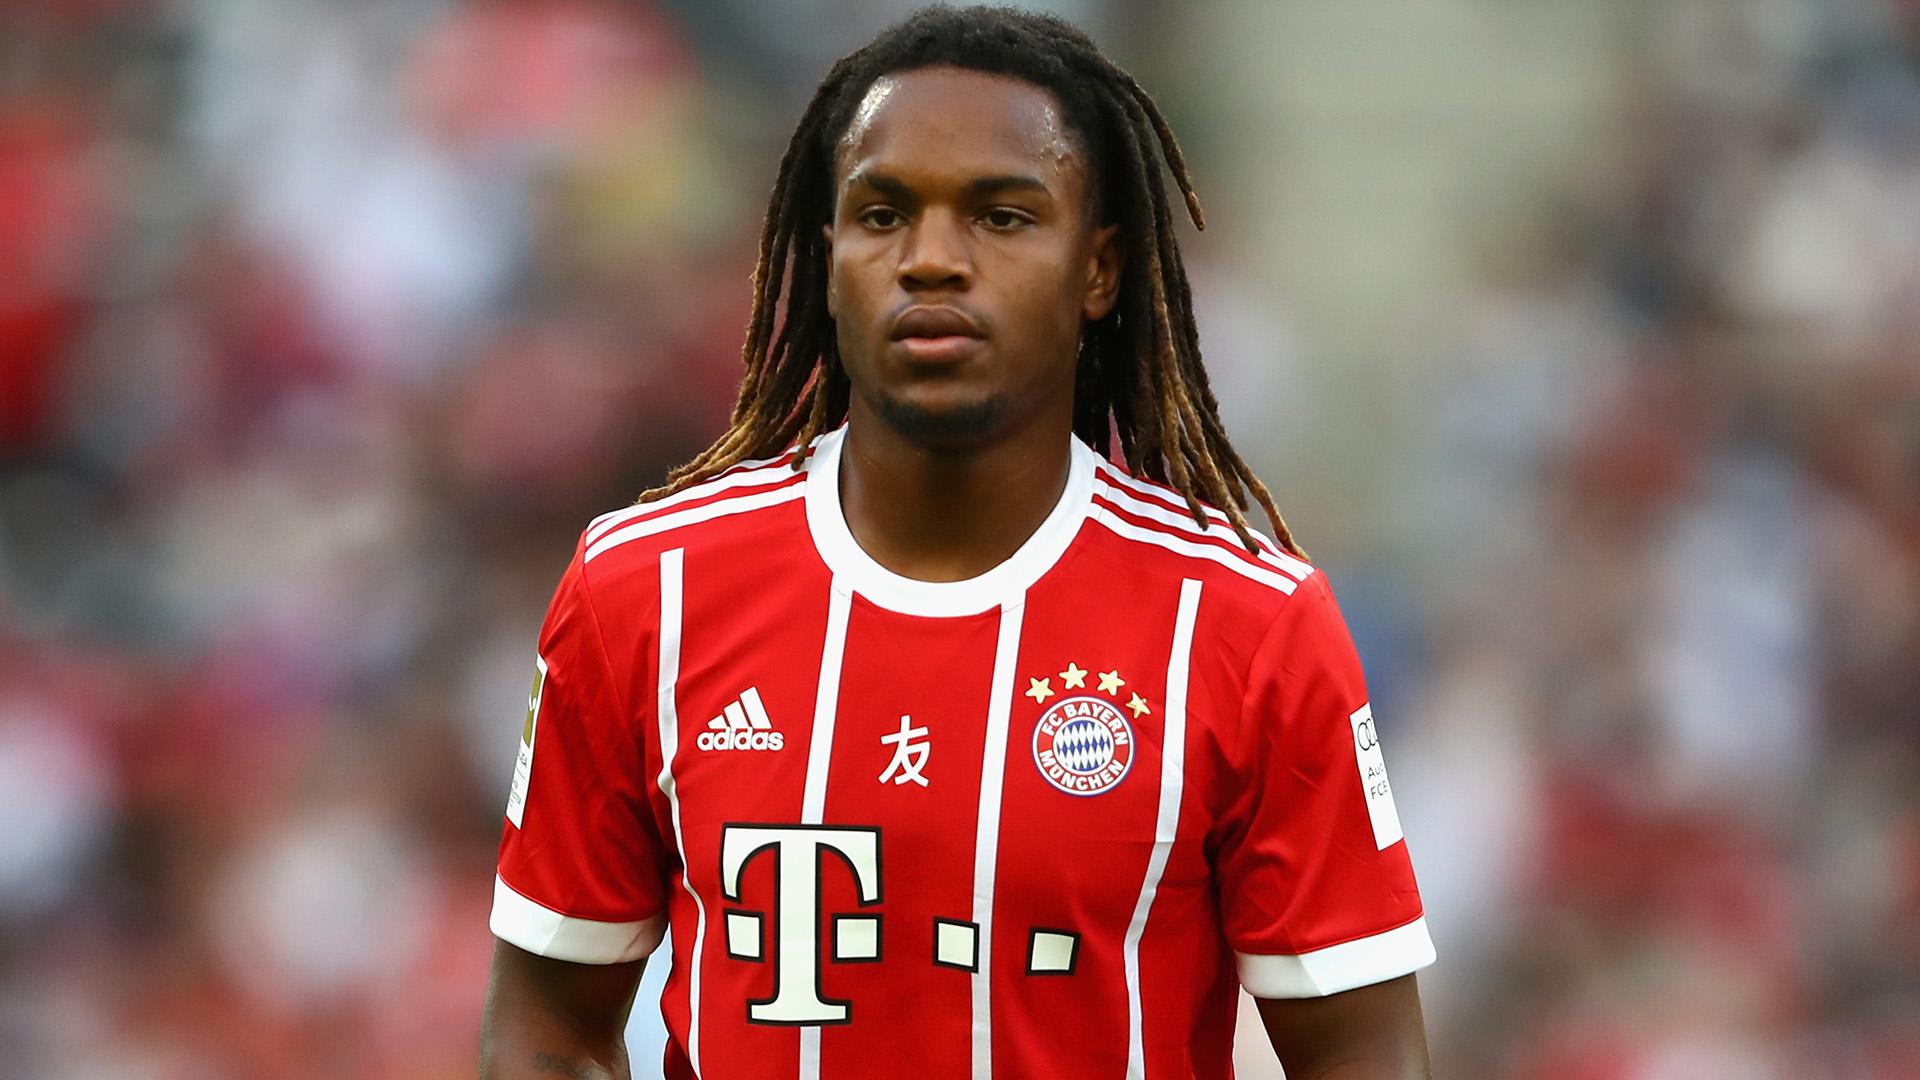 Bayern Munich Ceo Rummenigge Confirms Renato Sanches Loan To Swansea Goal Com